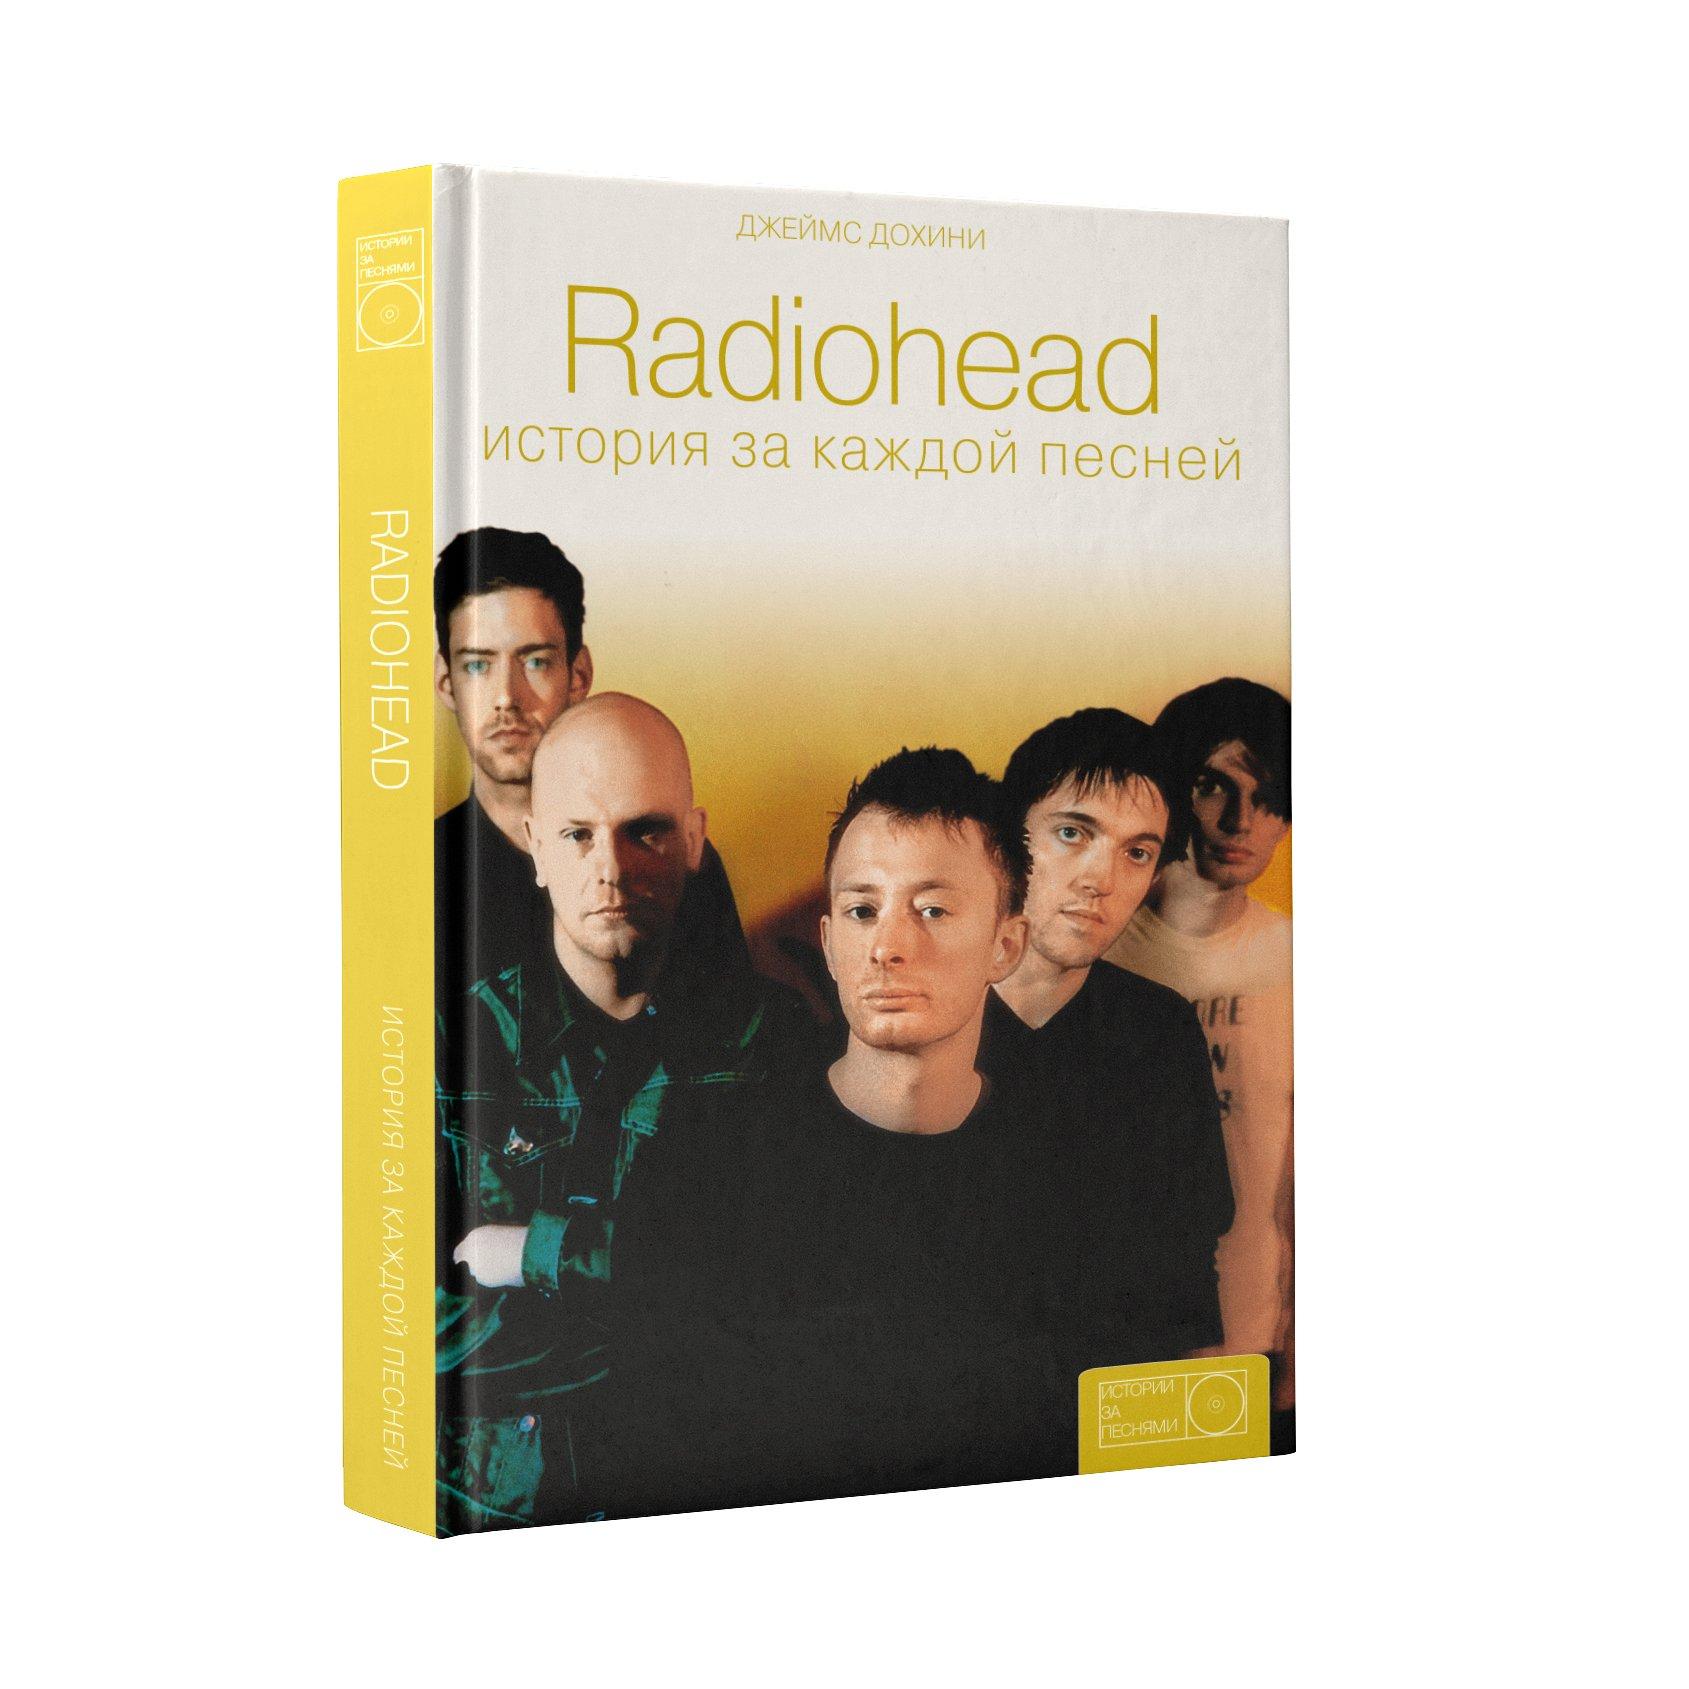 Фото - Доэни Джеймс Radiohead: история за каждой песней доэни д radiohead история за каждой песней